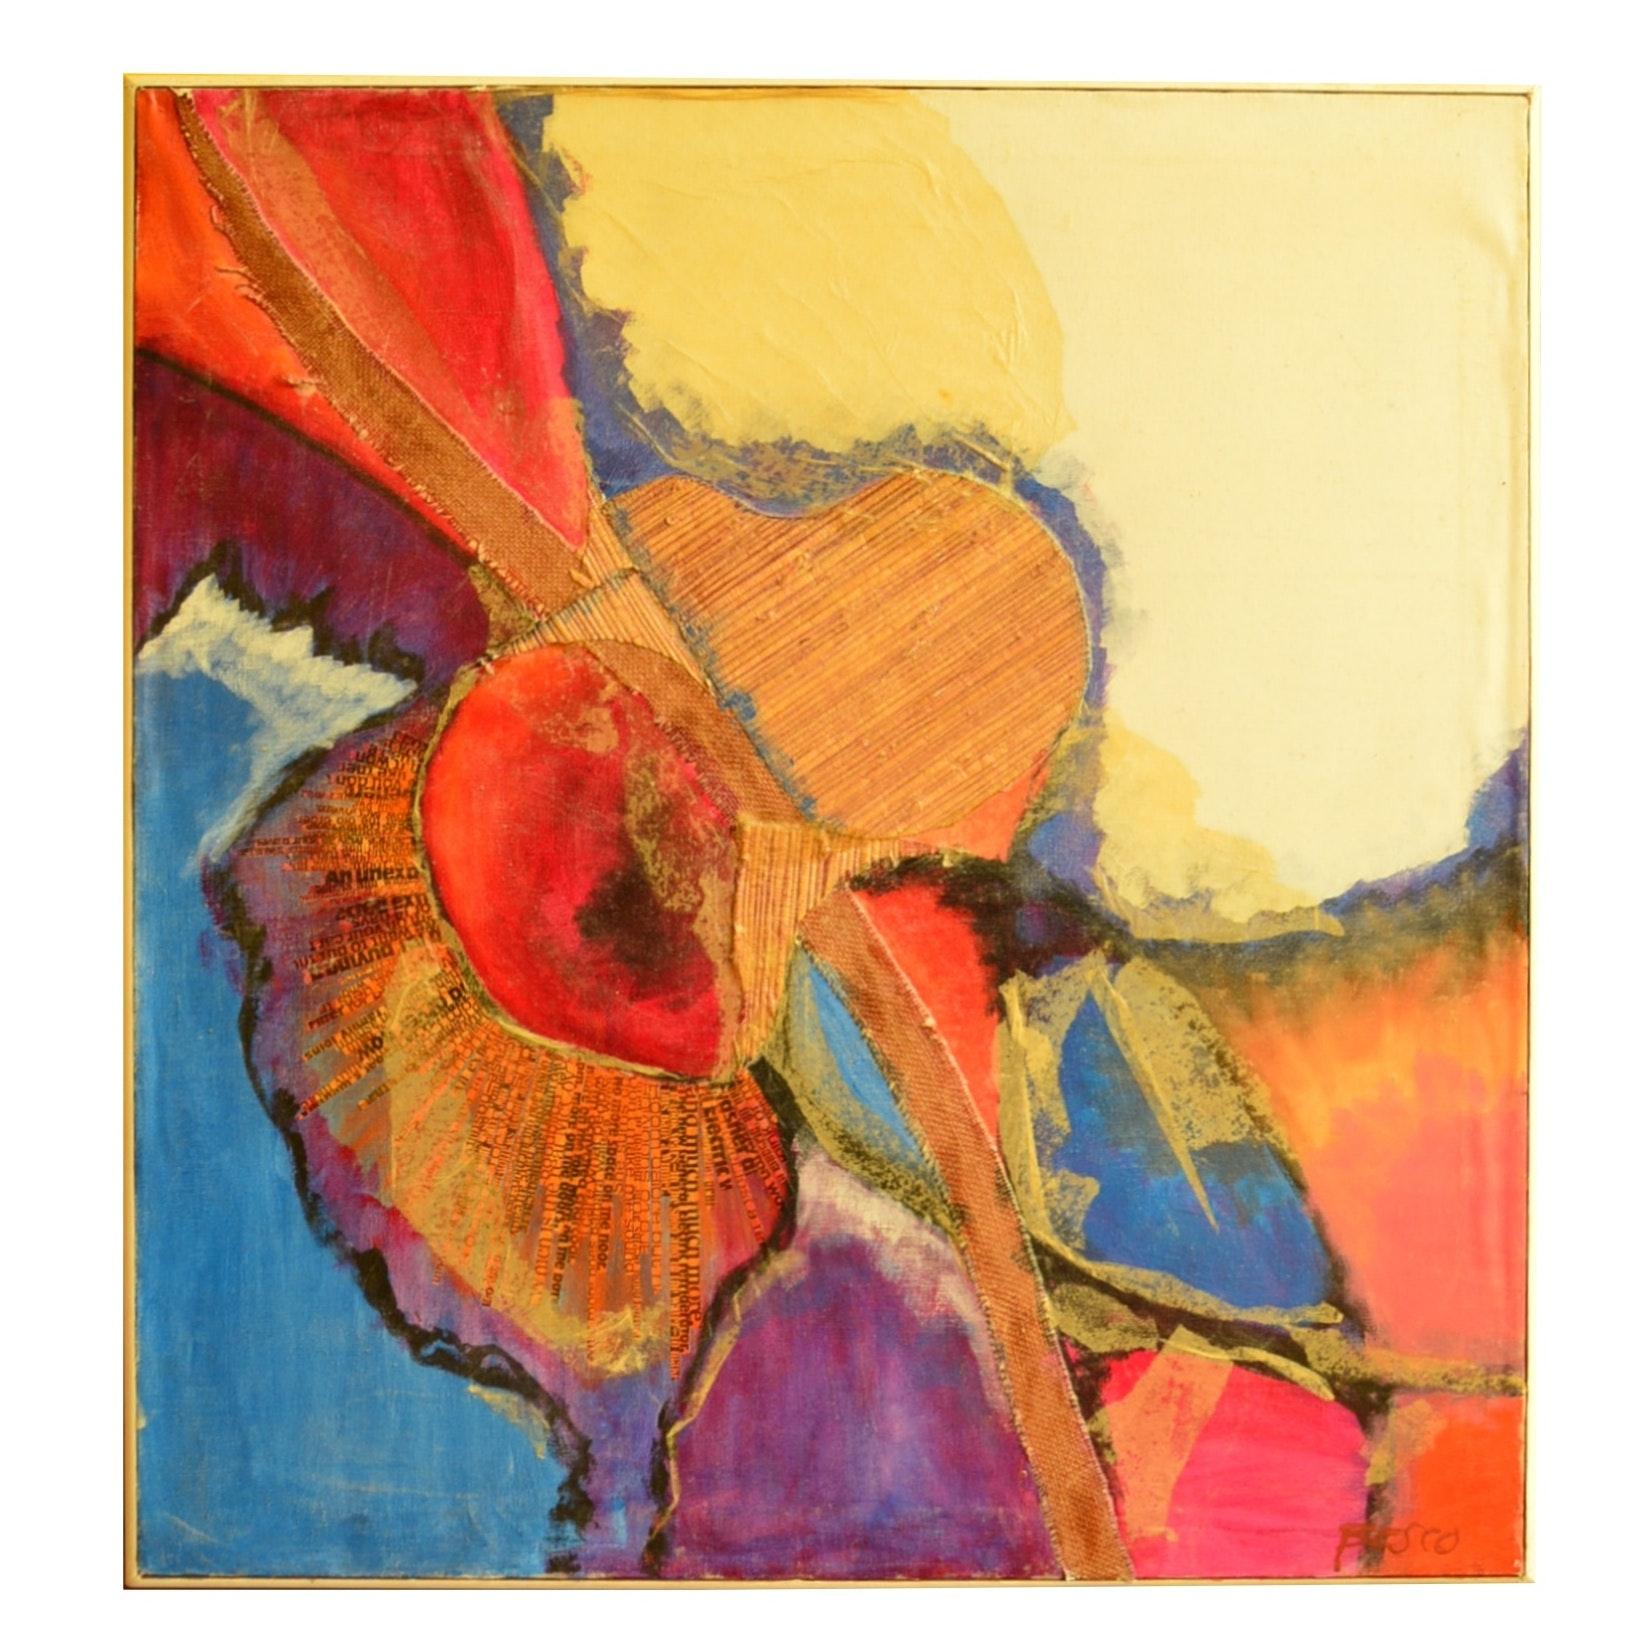 Besco Multi Media Collage Oil on Canvas